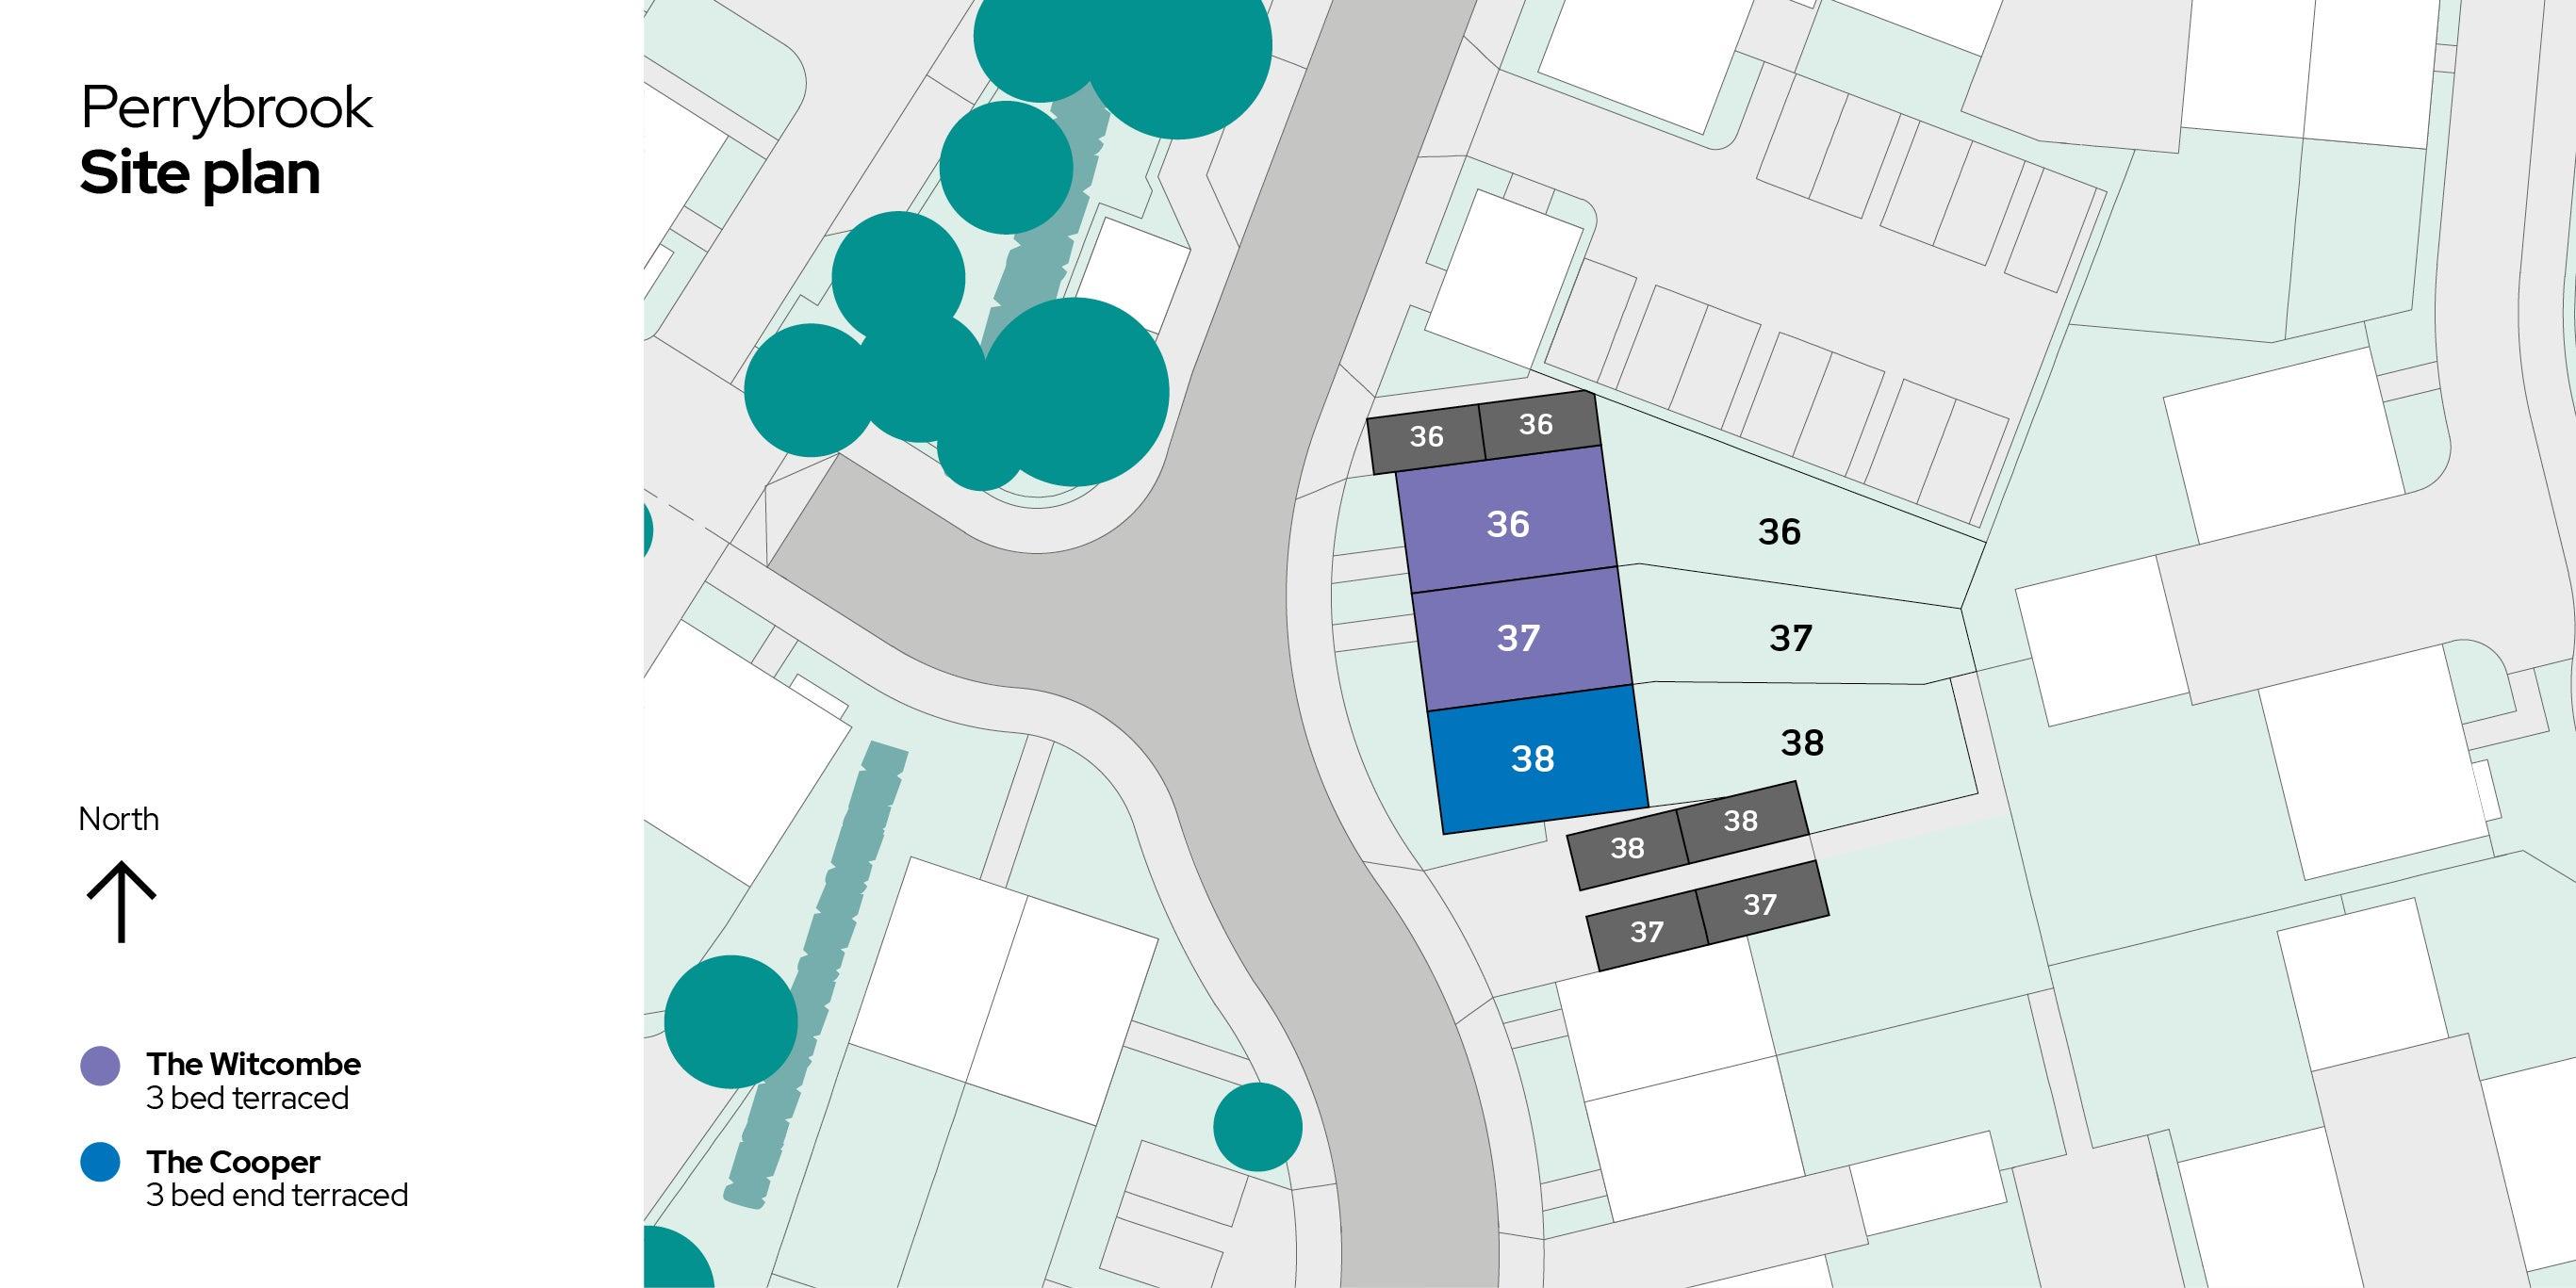 Perrybrook - Site plan